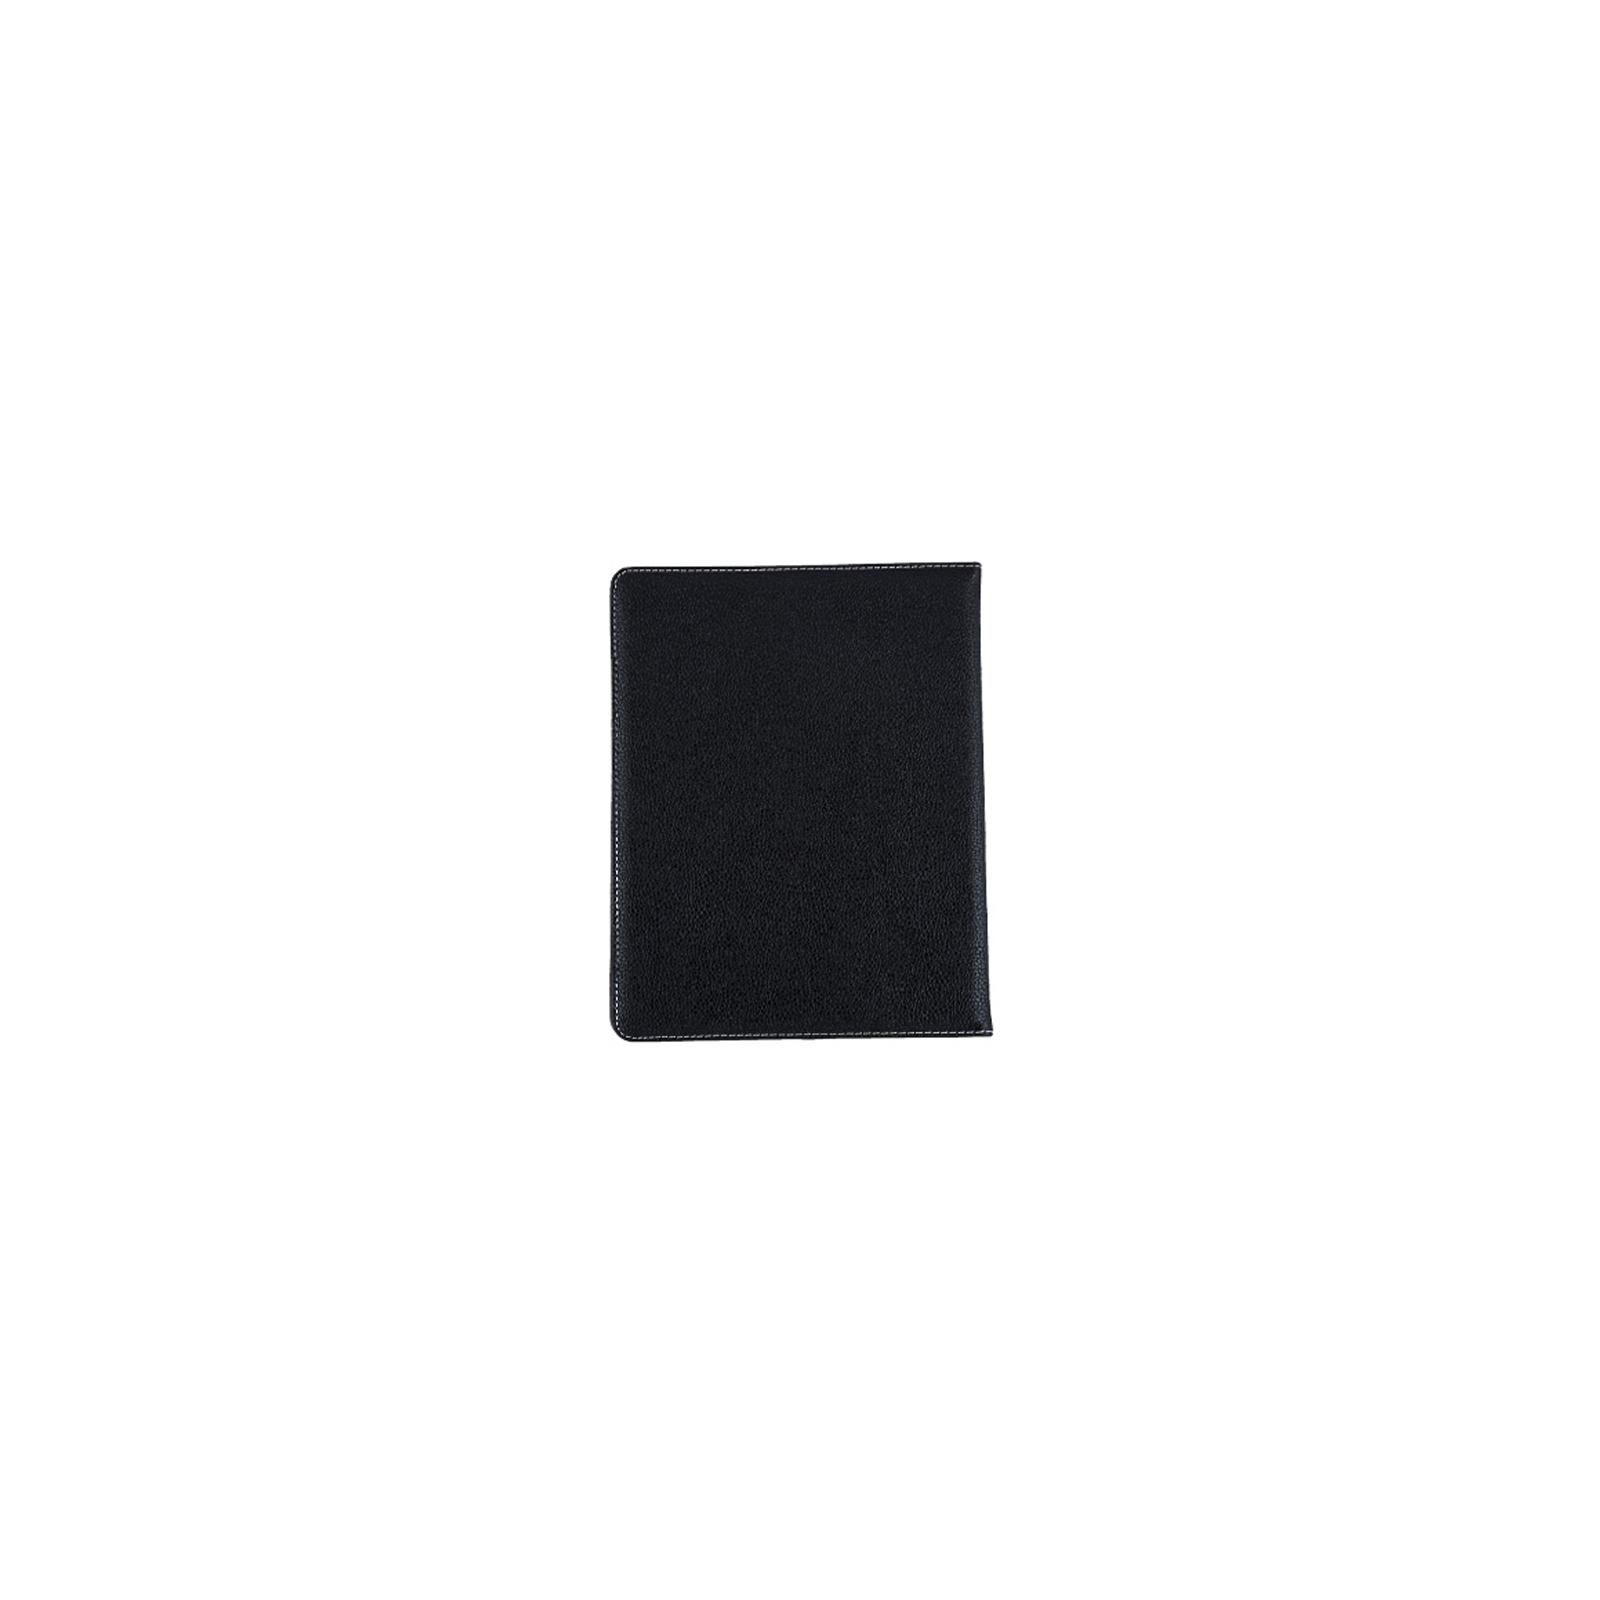 "Чехол для планшета Drobak 10""-10.1"" Universal Stand Black (216883) изображение 2"